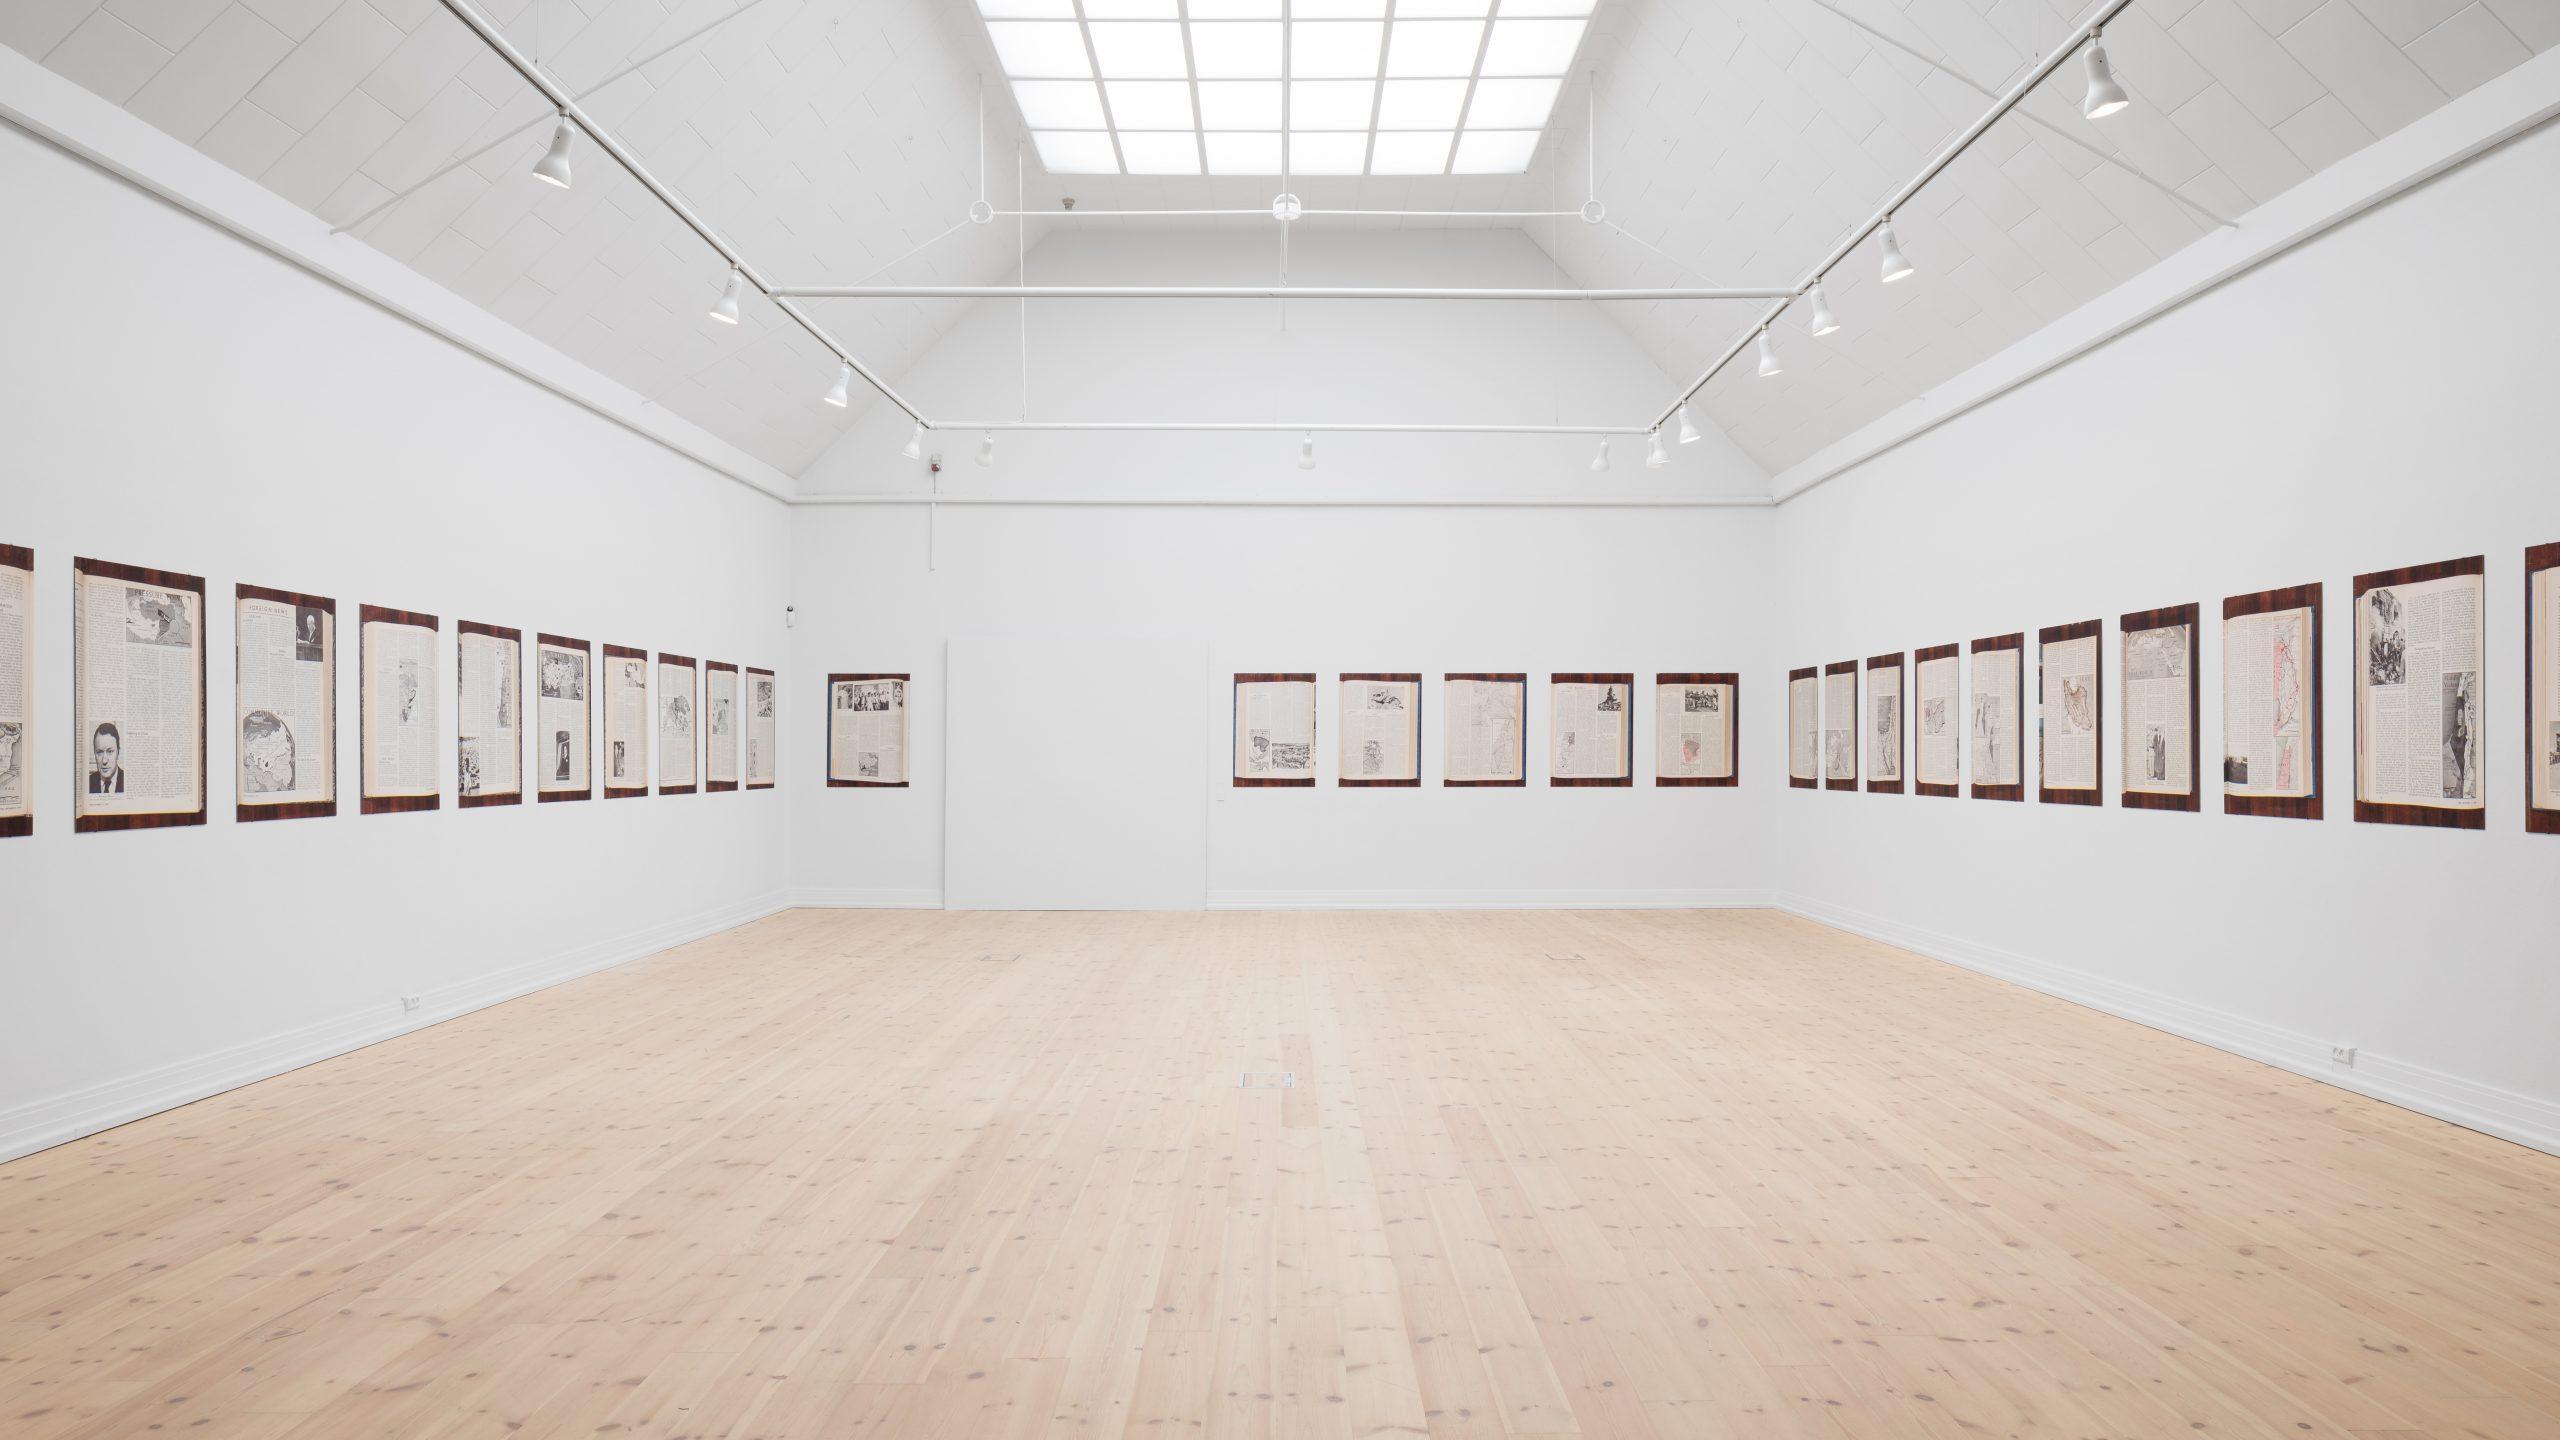 installation view Sven Augustijnen at Kunsthal Aarhus, 2020